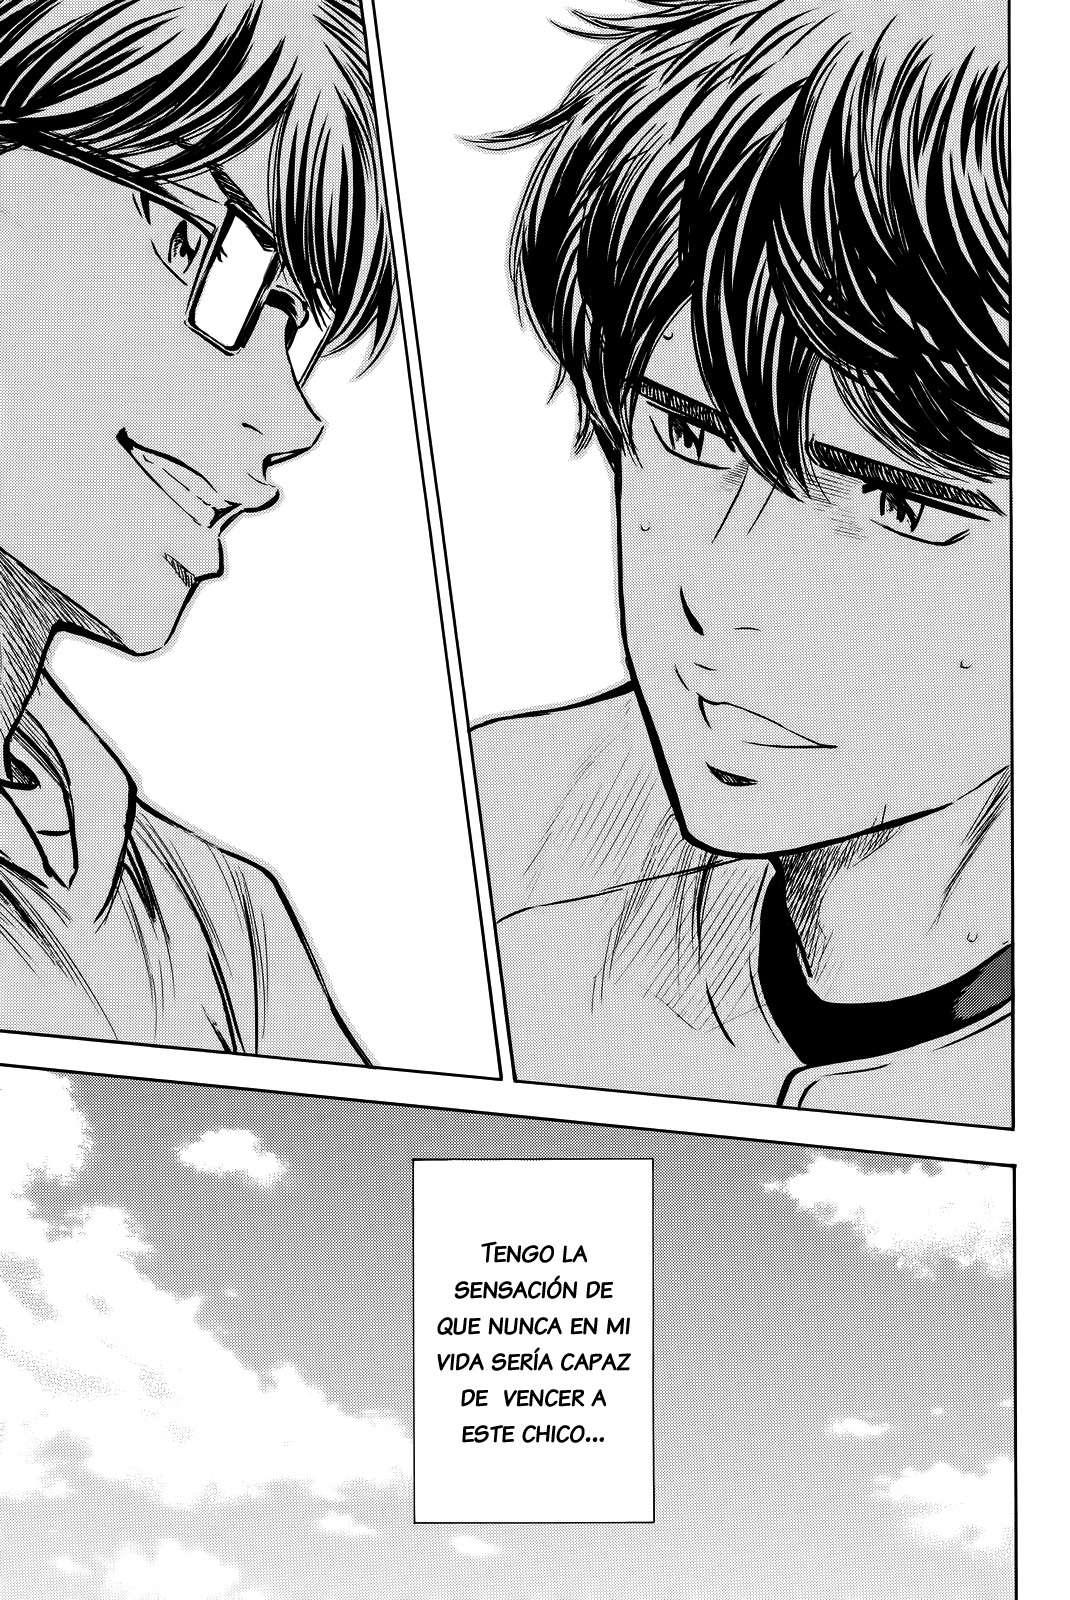 http://c5.ninemanga.com/es_manga/24/1752/430810/178b0113689dce8a7e48360c3886dc99.jpg Page 23